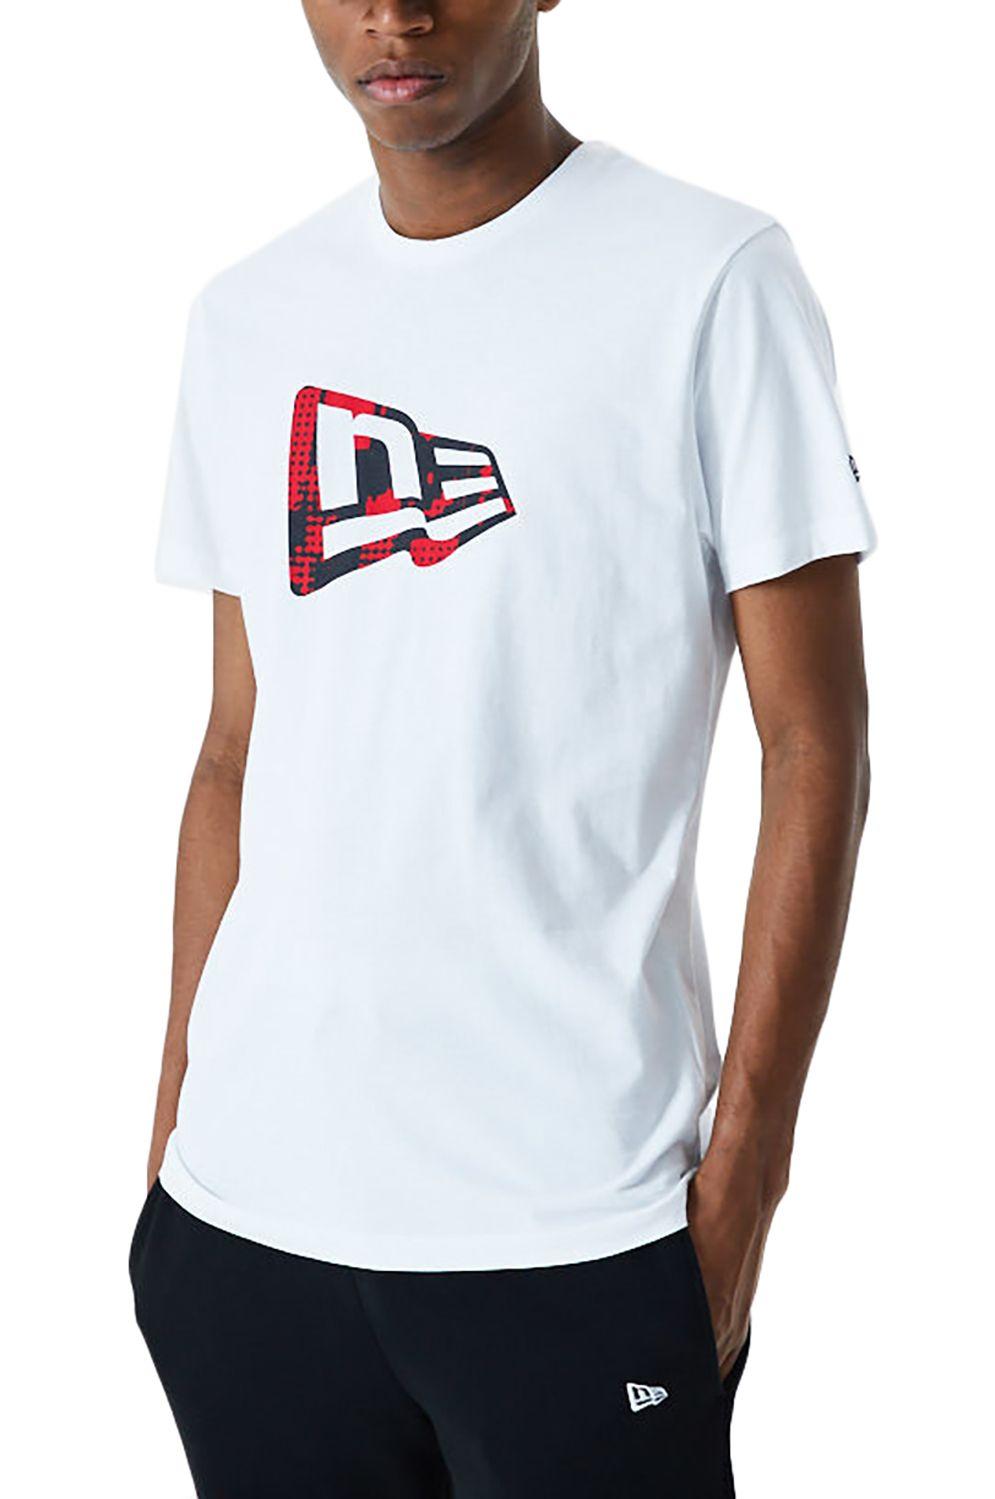 New Era T-Shirt NE ESSENTL FLAG INFILL TEE White/Cyr